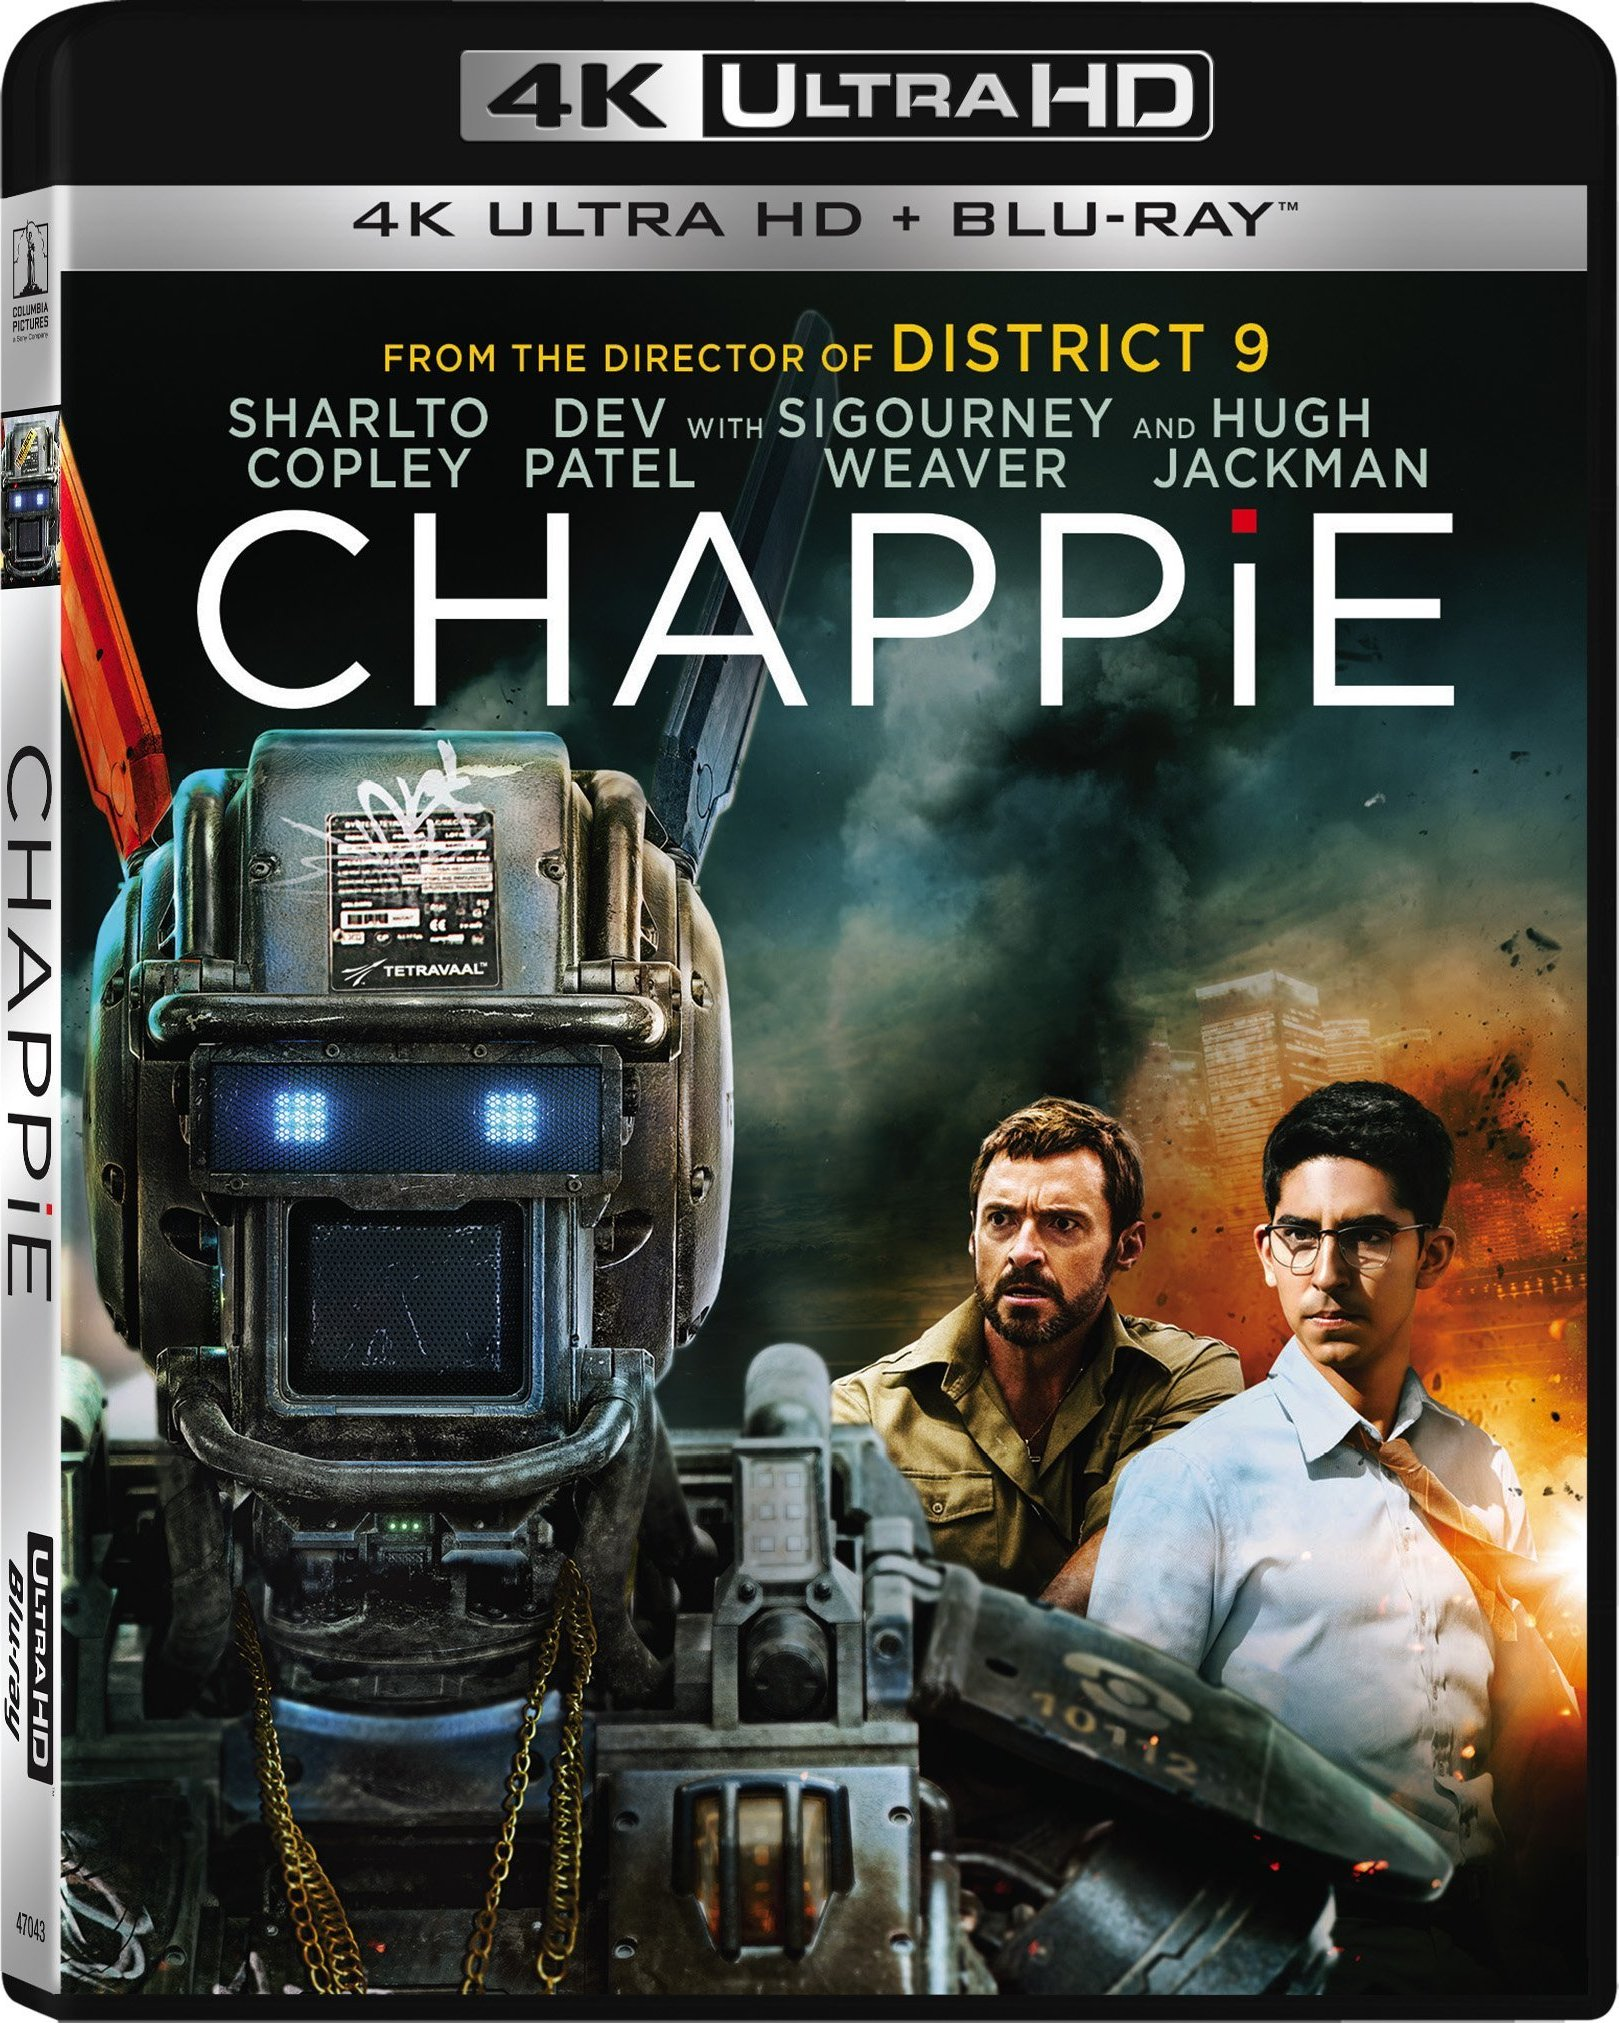 Chappie (2015) 4K Ultra HD Blu-ray